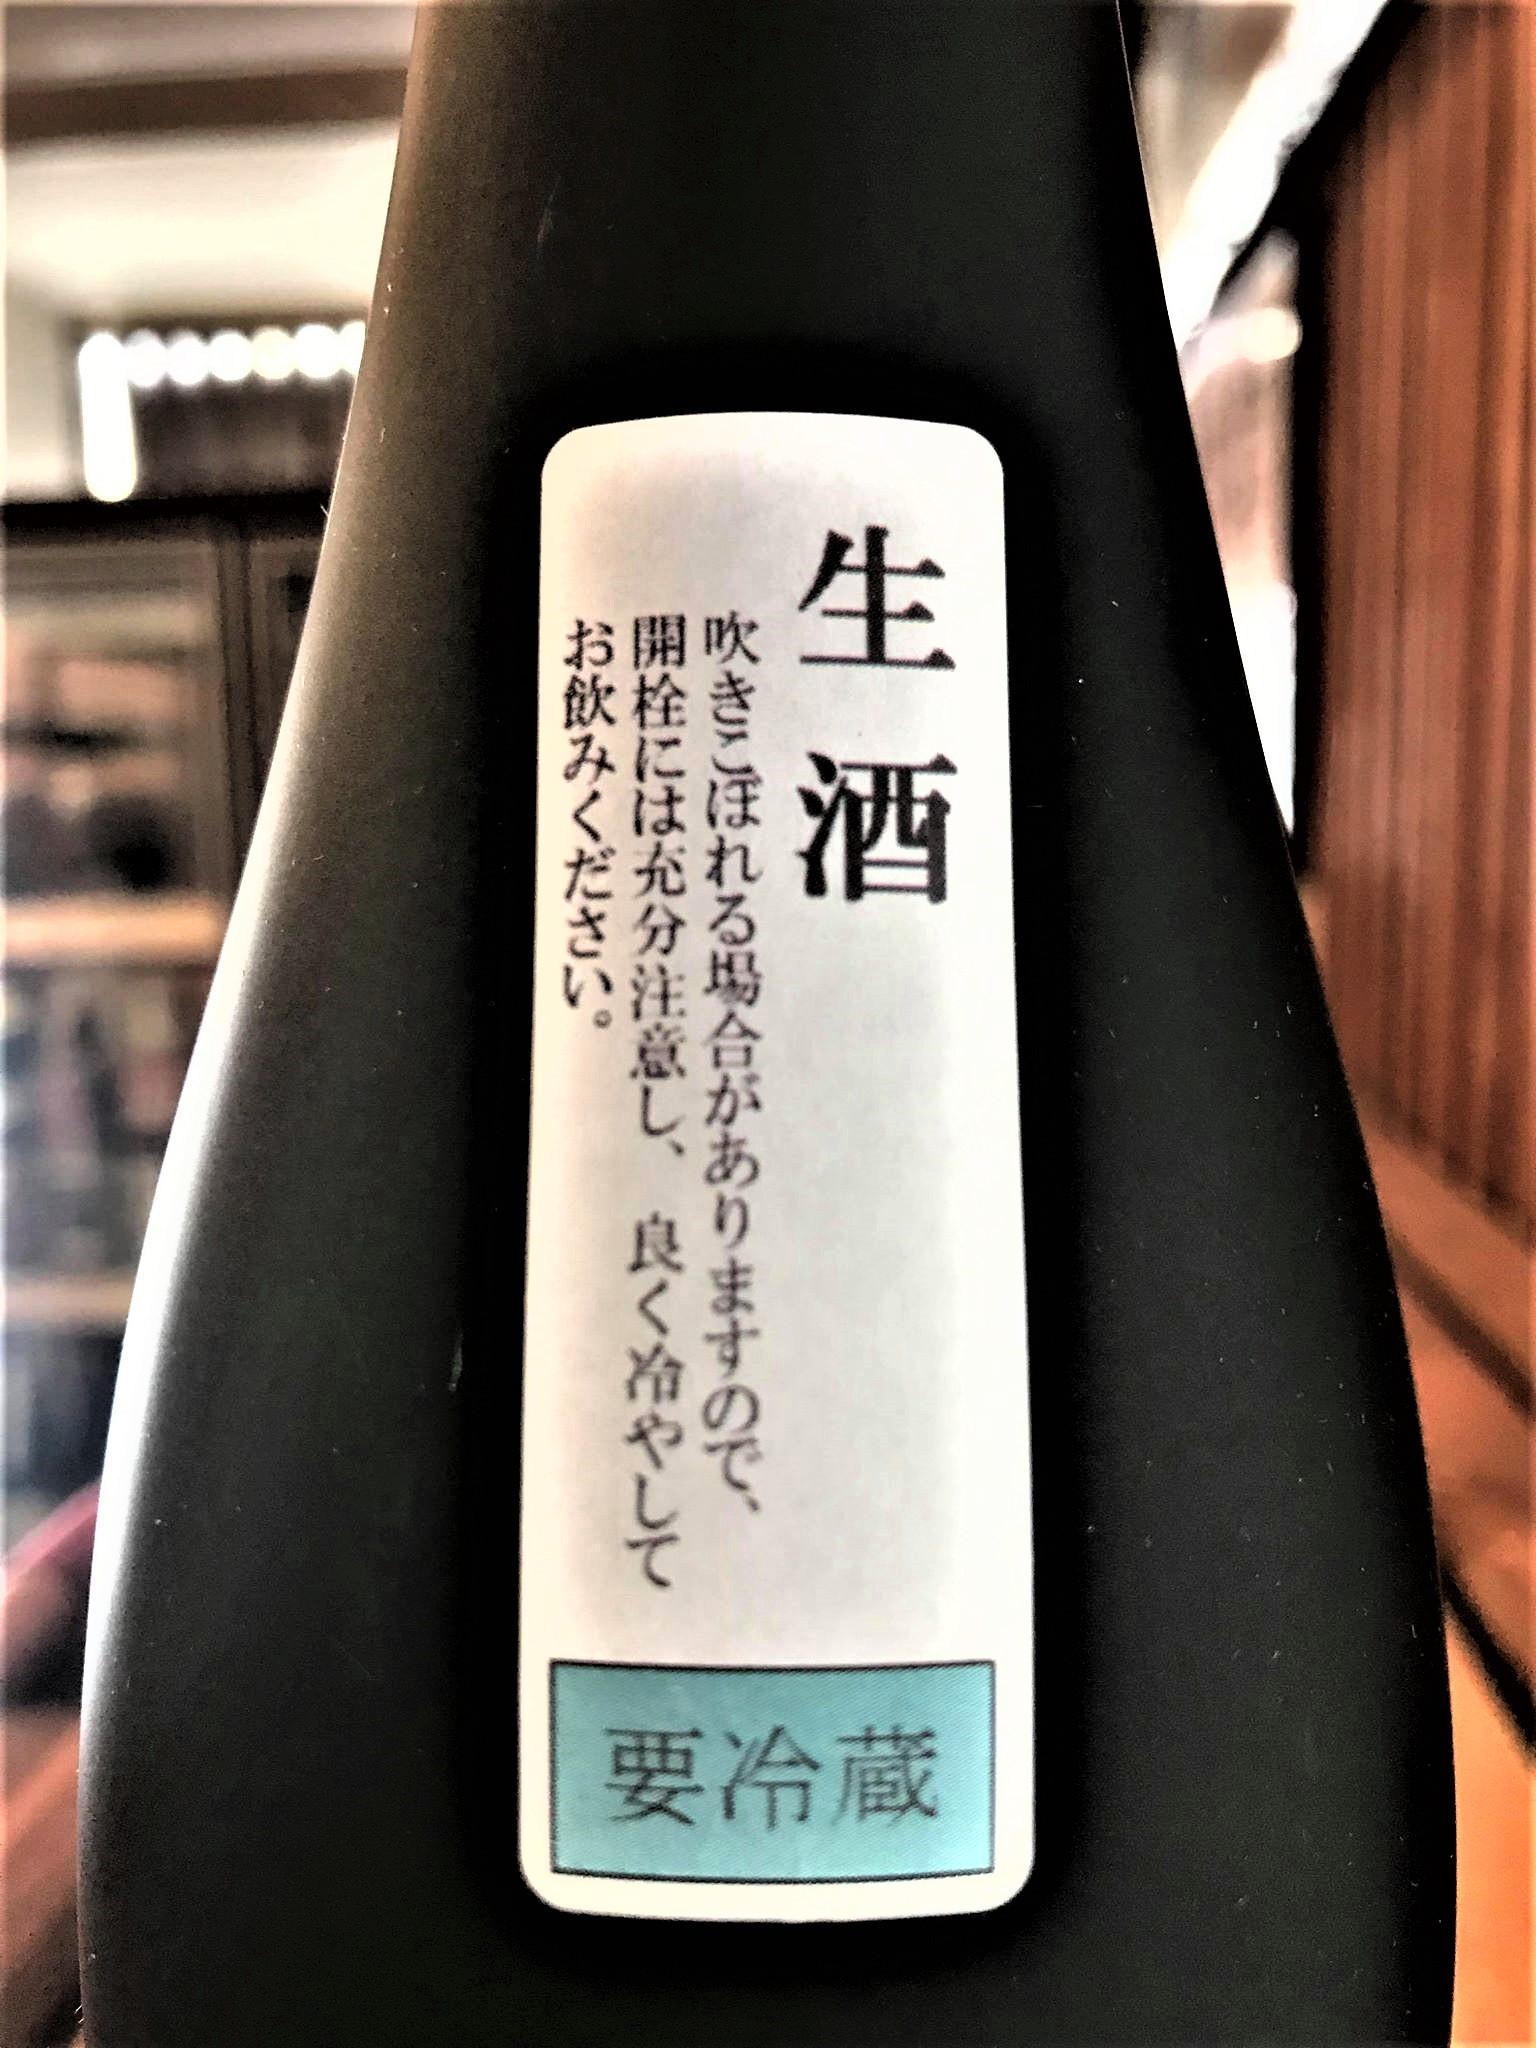 【日本酒】醸す森『kamosu mori』純米大吟醸生酒 五百万石50磨き 蔵元特別限定蔵出し 令和1BY🆕_e0173738_2037393.jpg